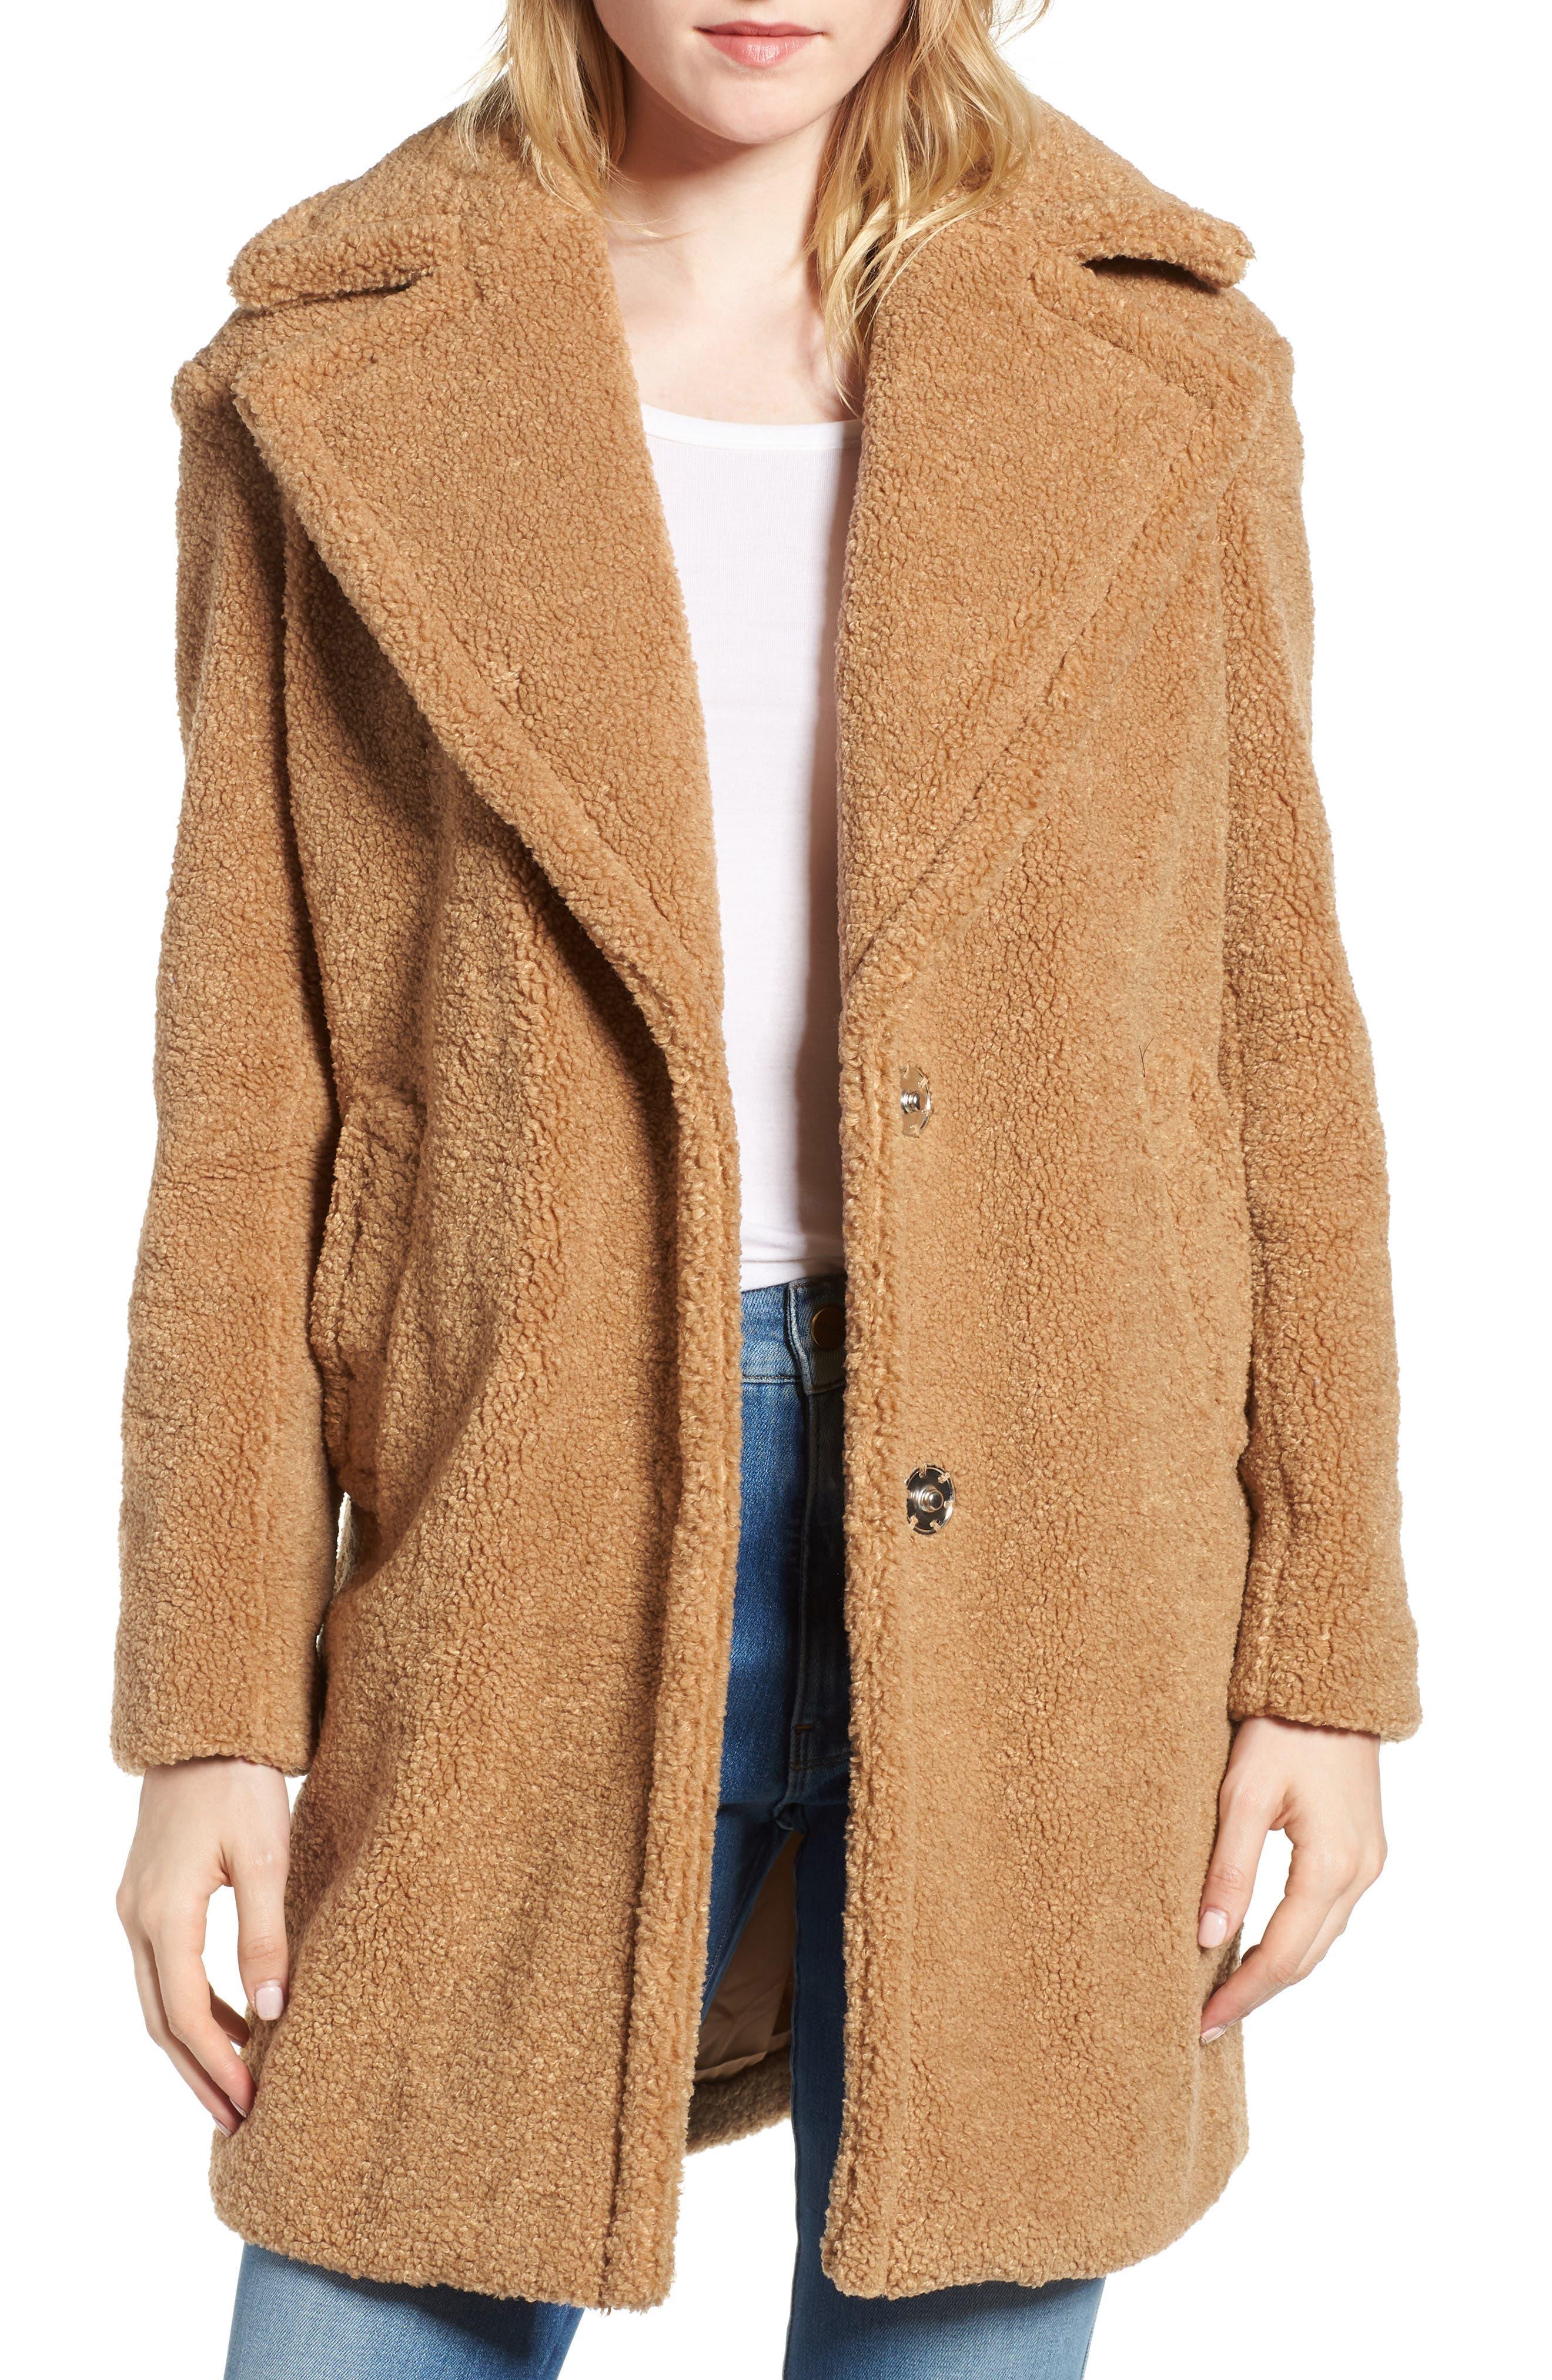 Faux Fur Teddy Bear Coat,                             Main thumbnail 1, color,                             256